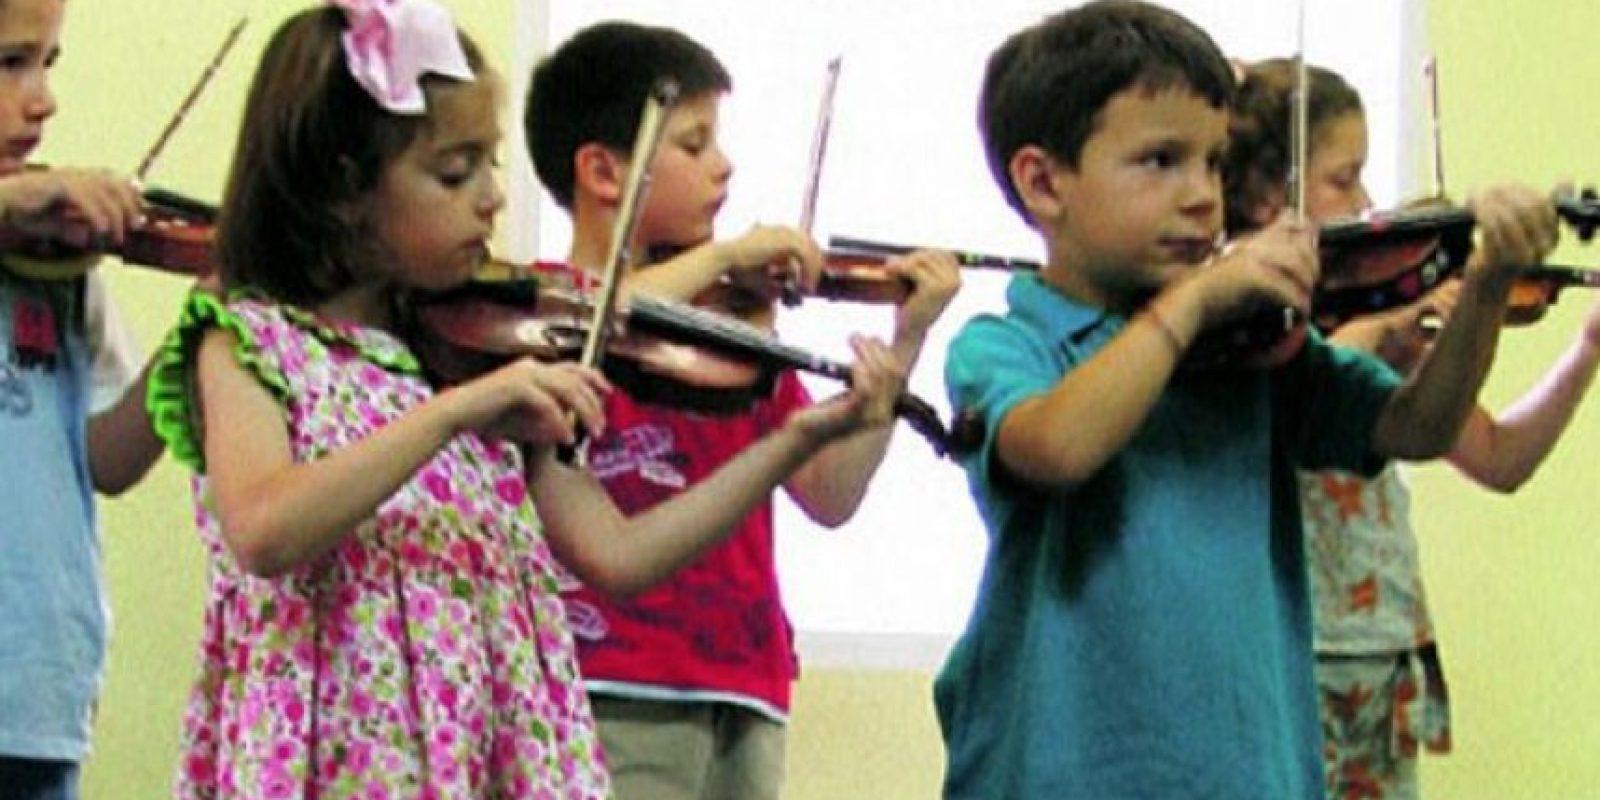 Ellos son talentosos a la hora de tocar el violín. Foto:Vïa Imgur